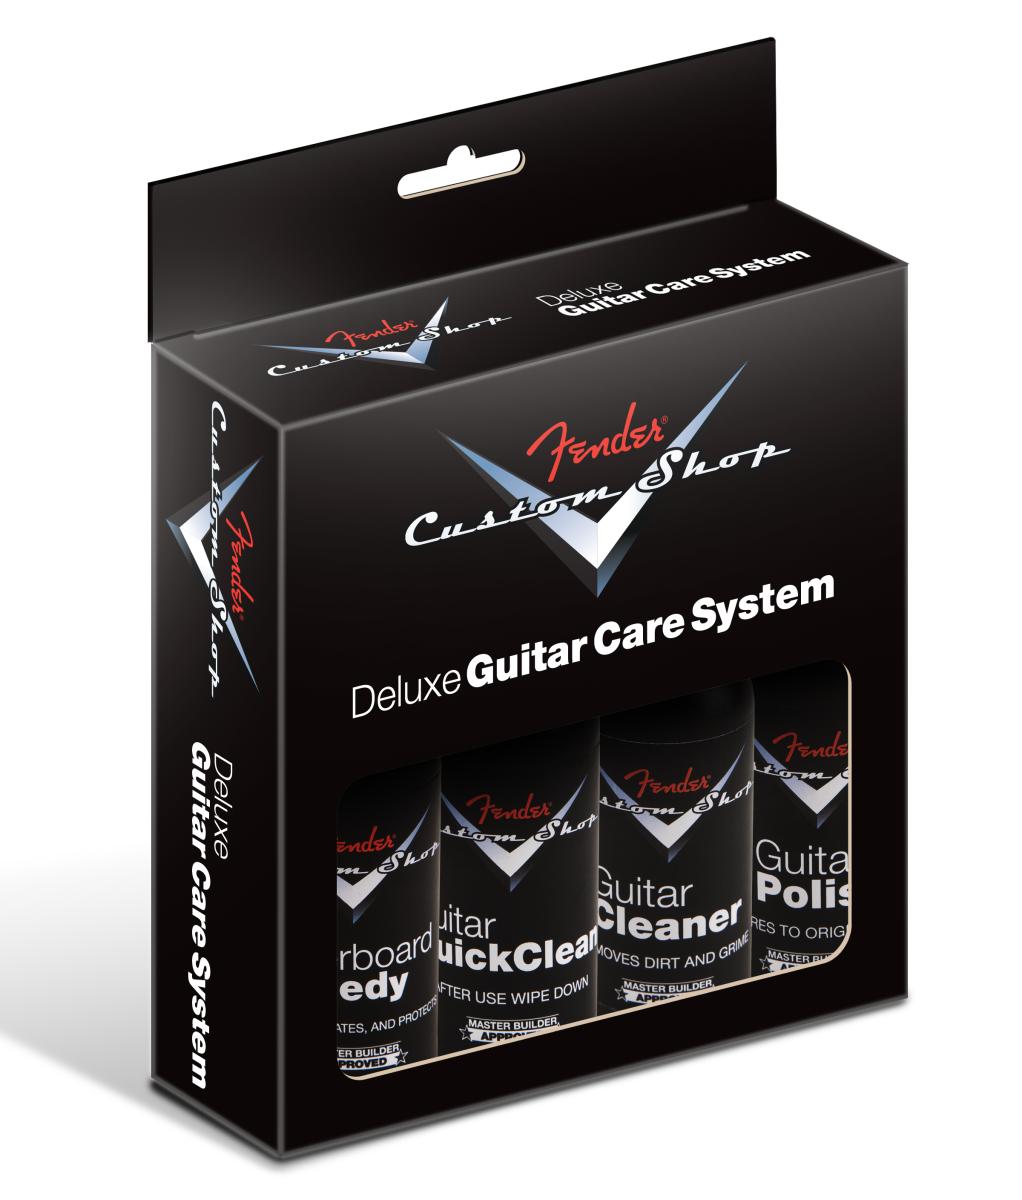 Fender Custom Shop 4-Step Cleaning Kit (4 pack)